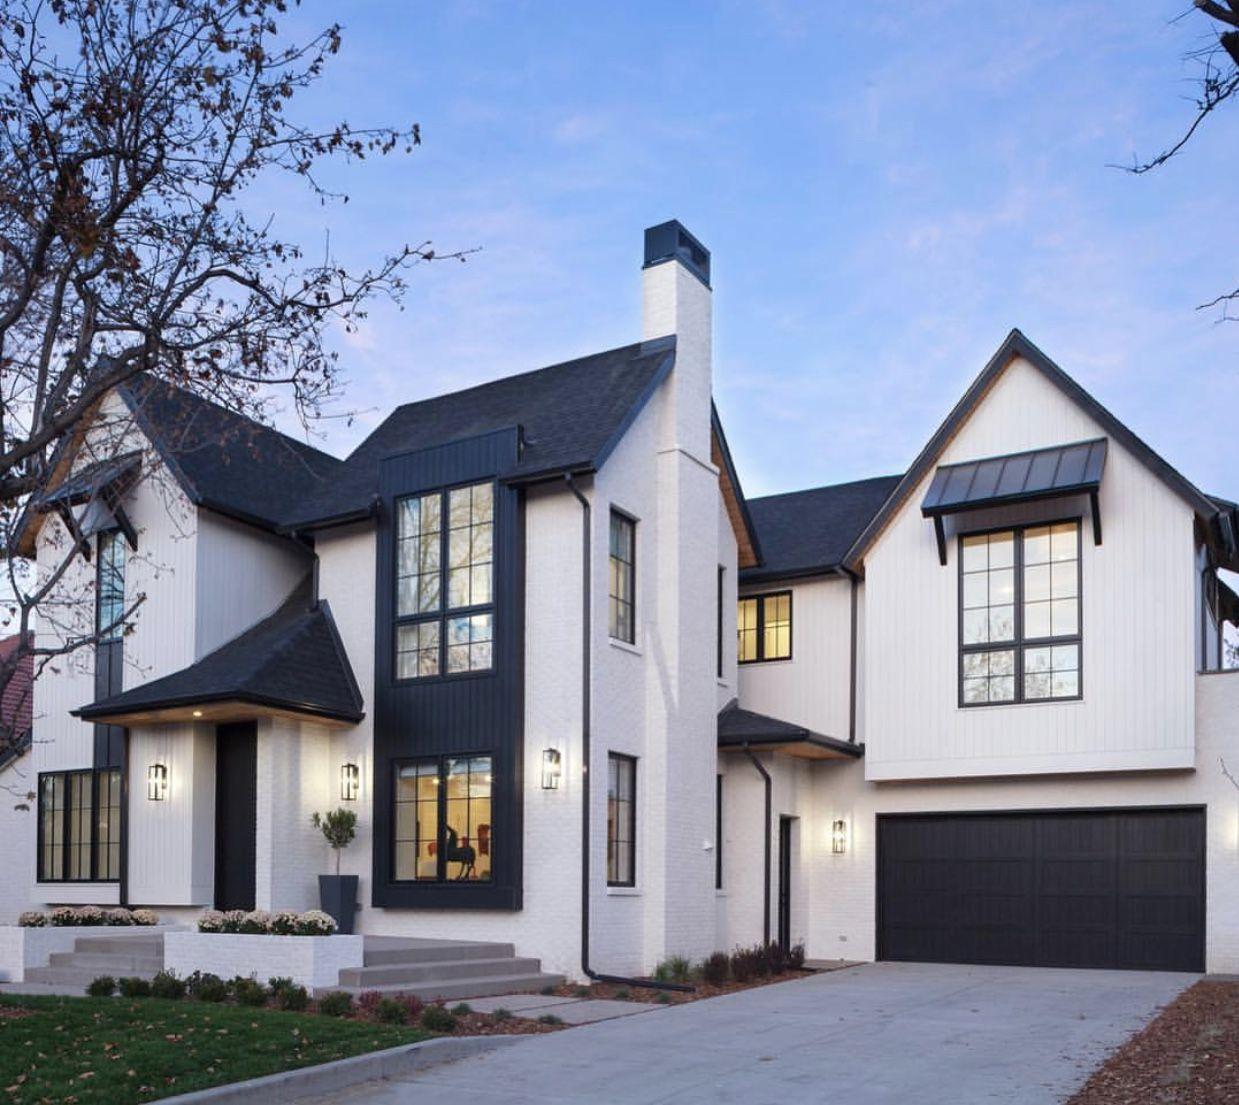 Black And White Home Exterior Modern Farmhouse Exterior